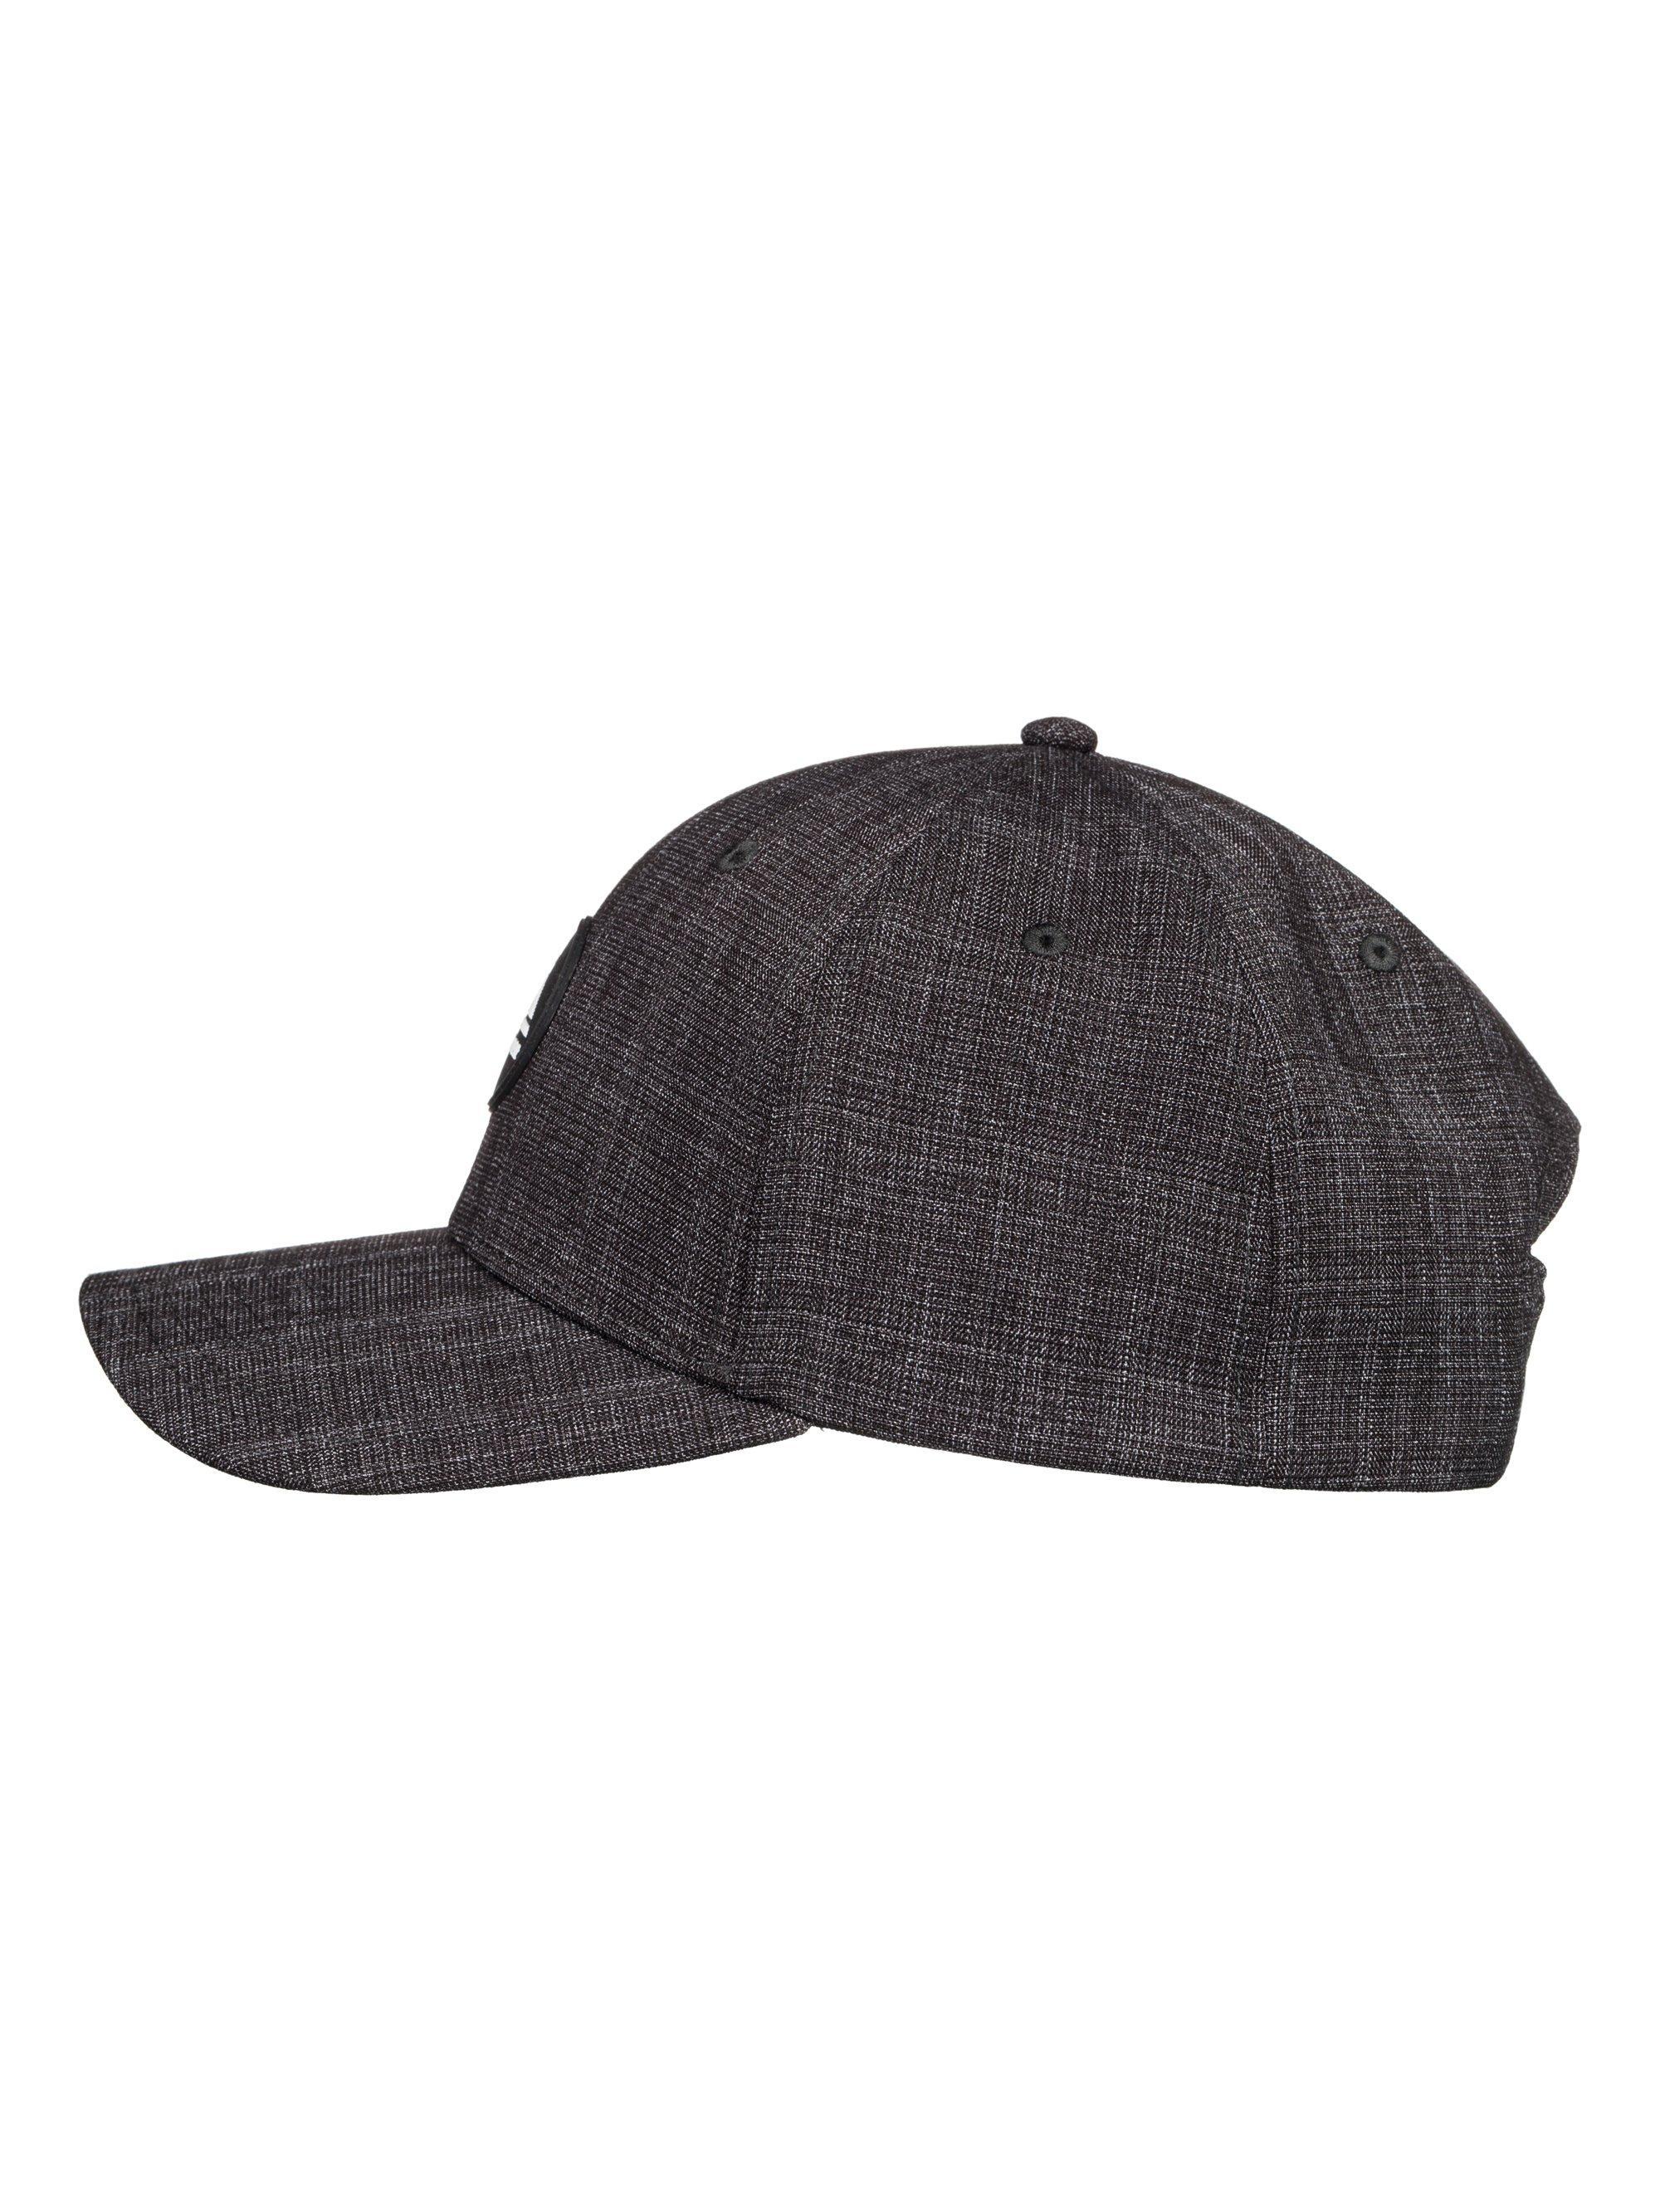 Super Unleaded Hat, Navy, swatch